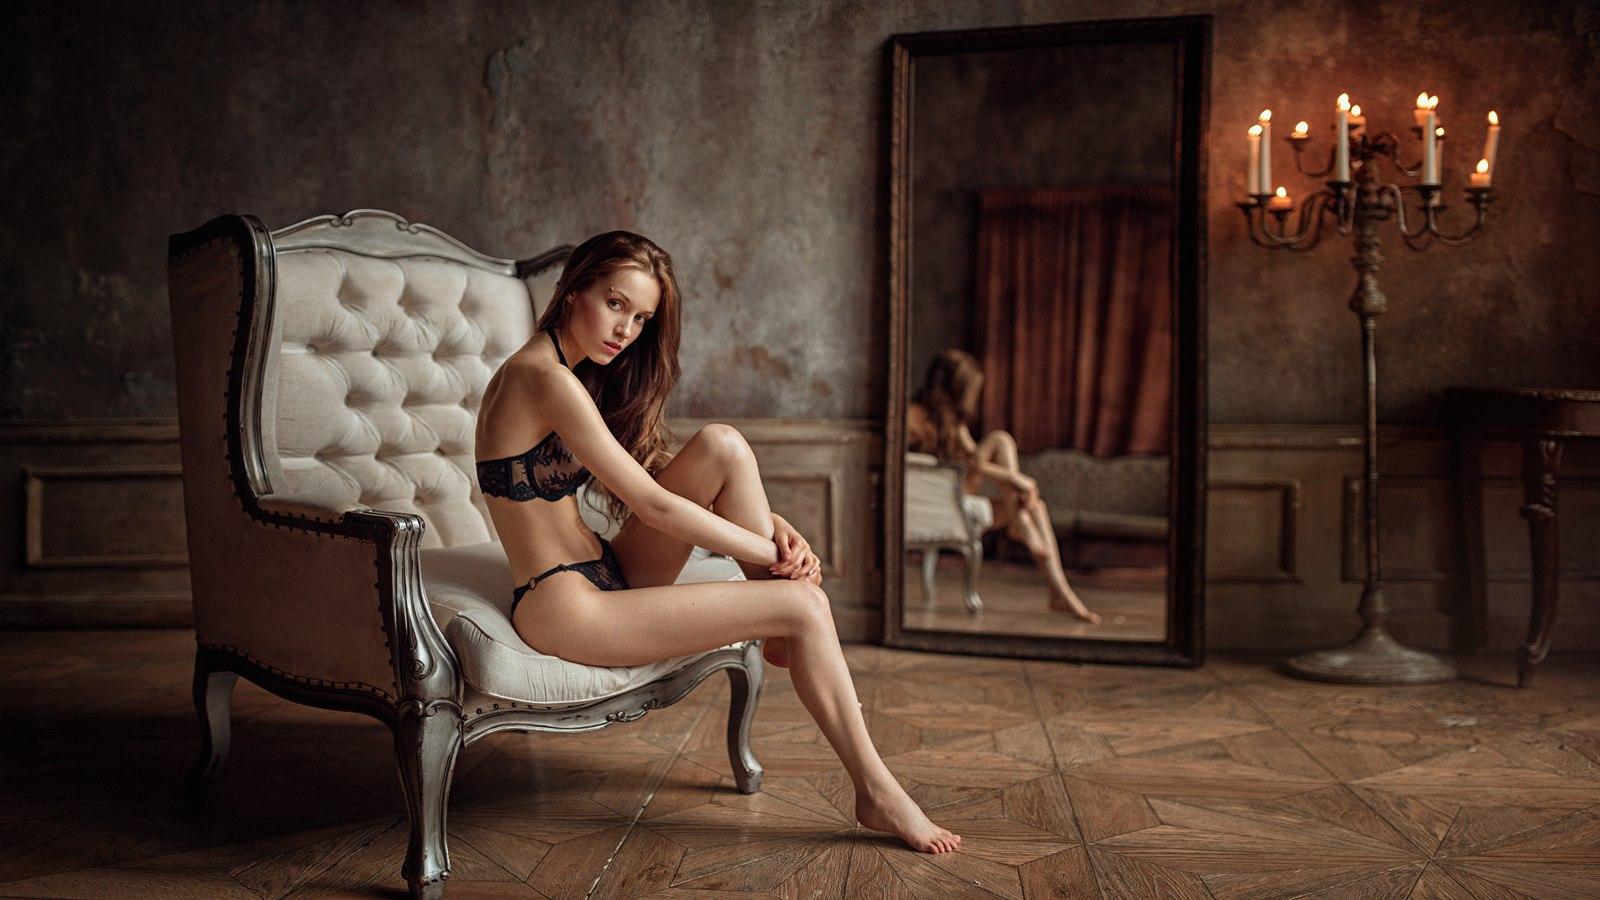 Bangkok sex naked girls professional photos